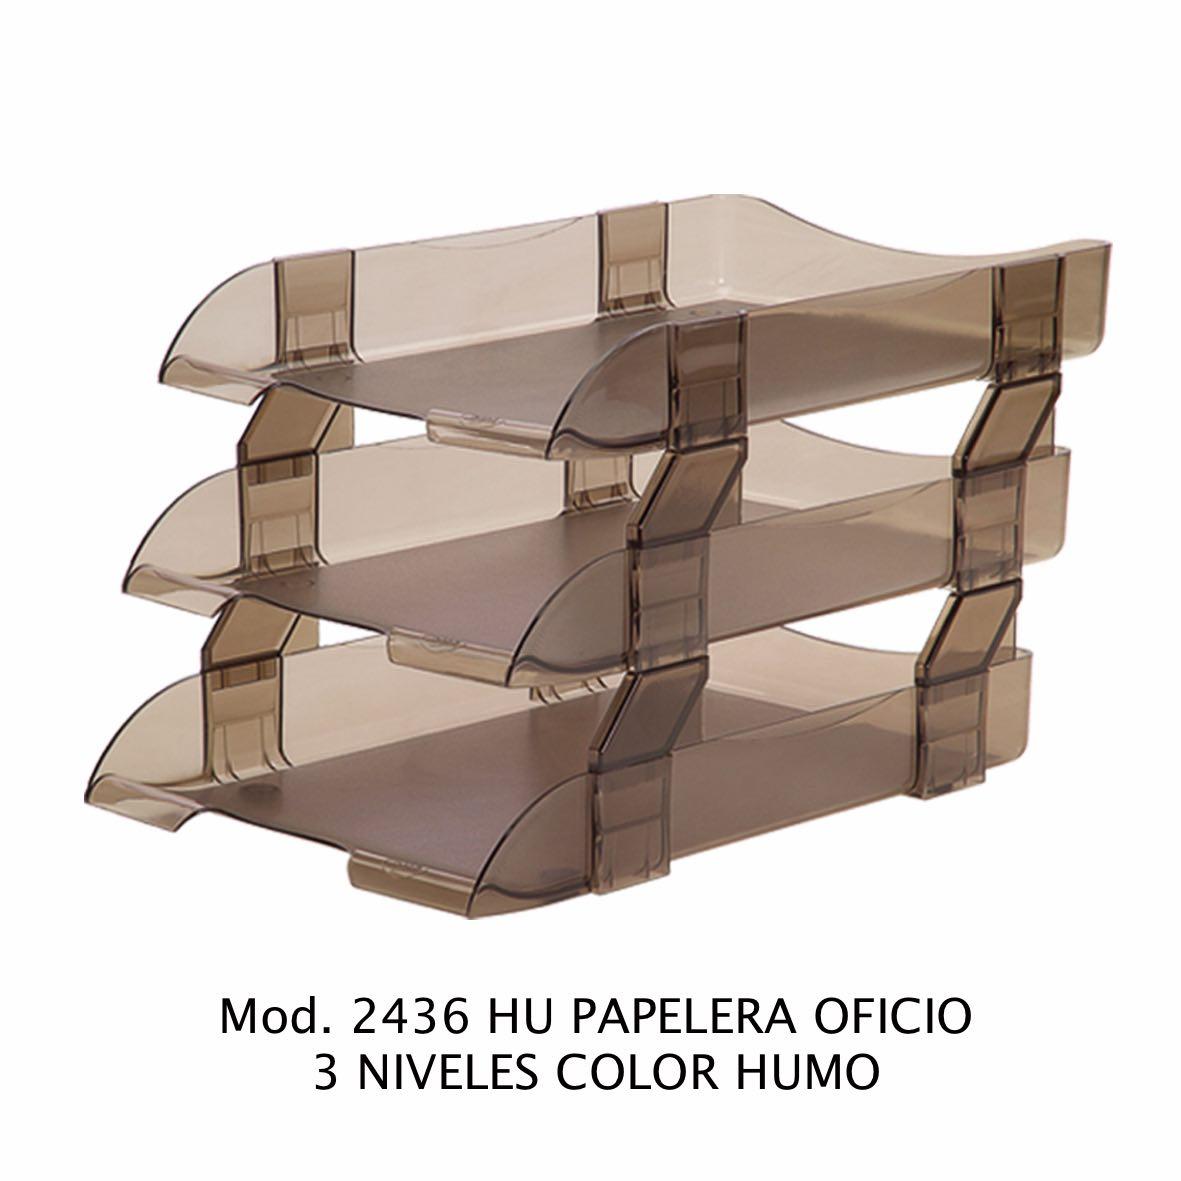 Charola de escritorio tamaño oficio de 3 niveles color humo Modelo 2436 HU - Sablón